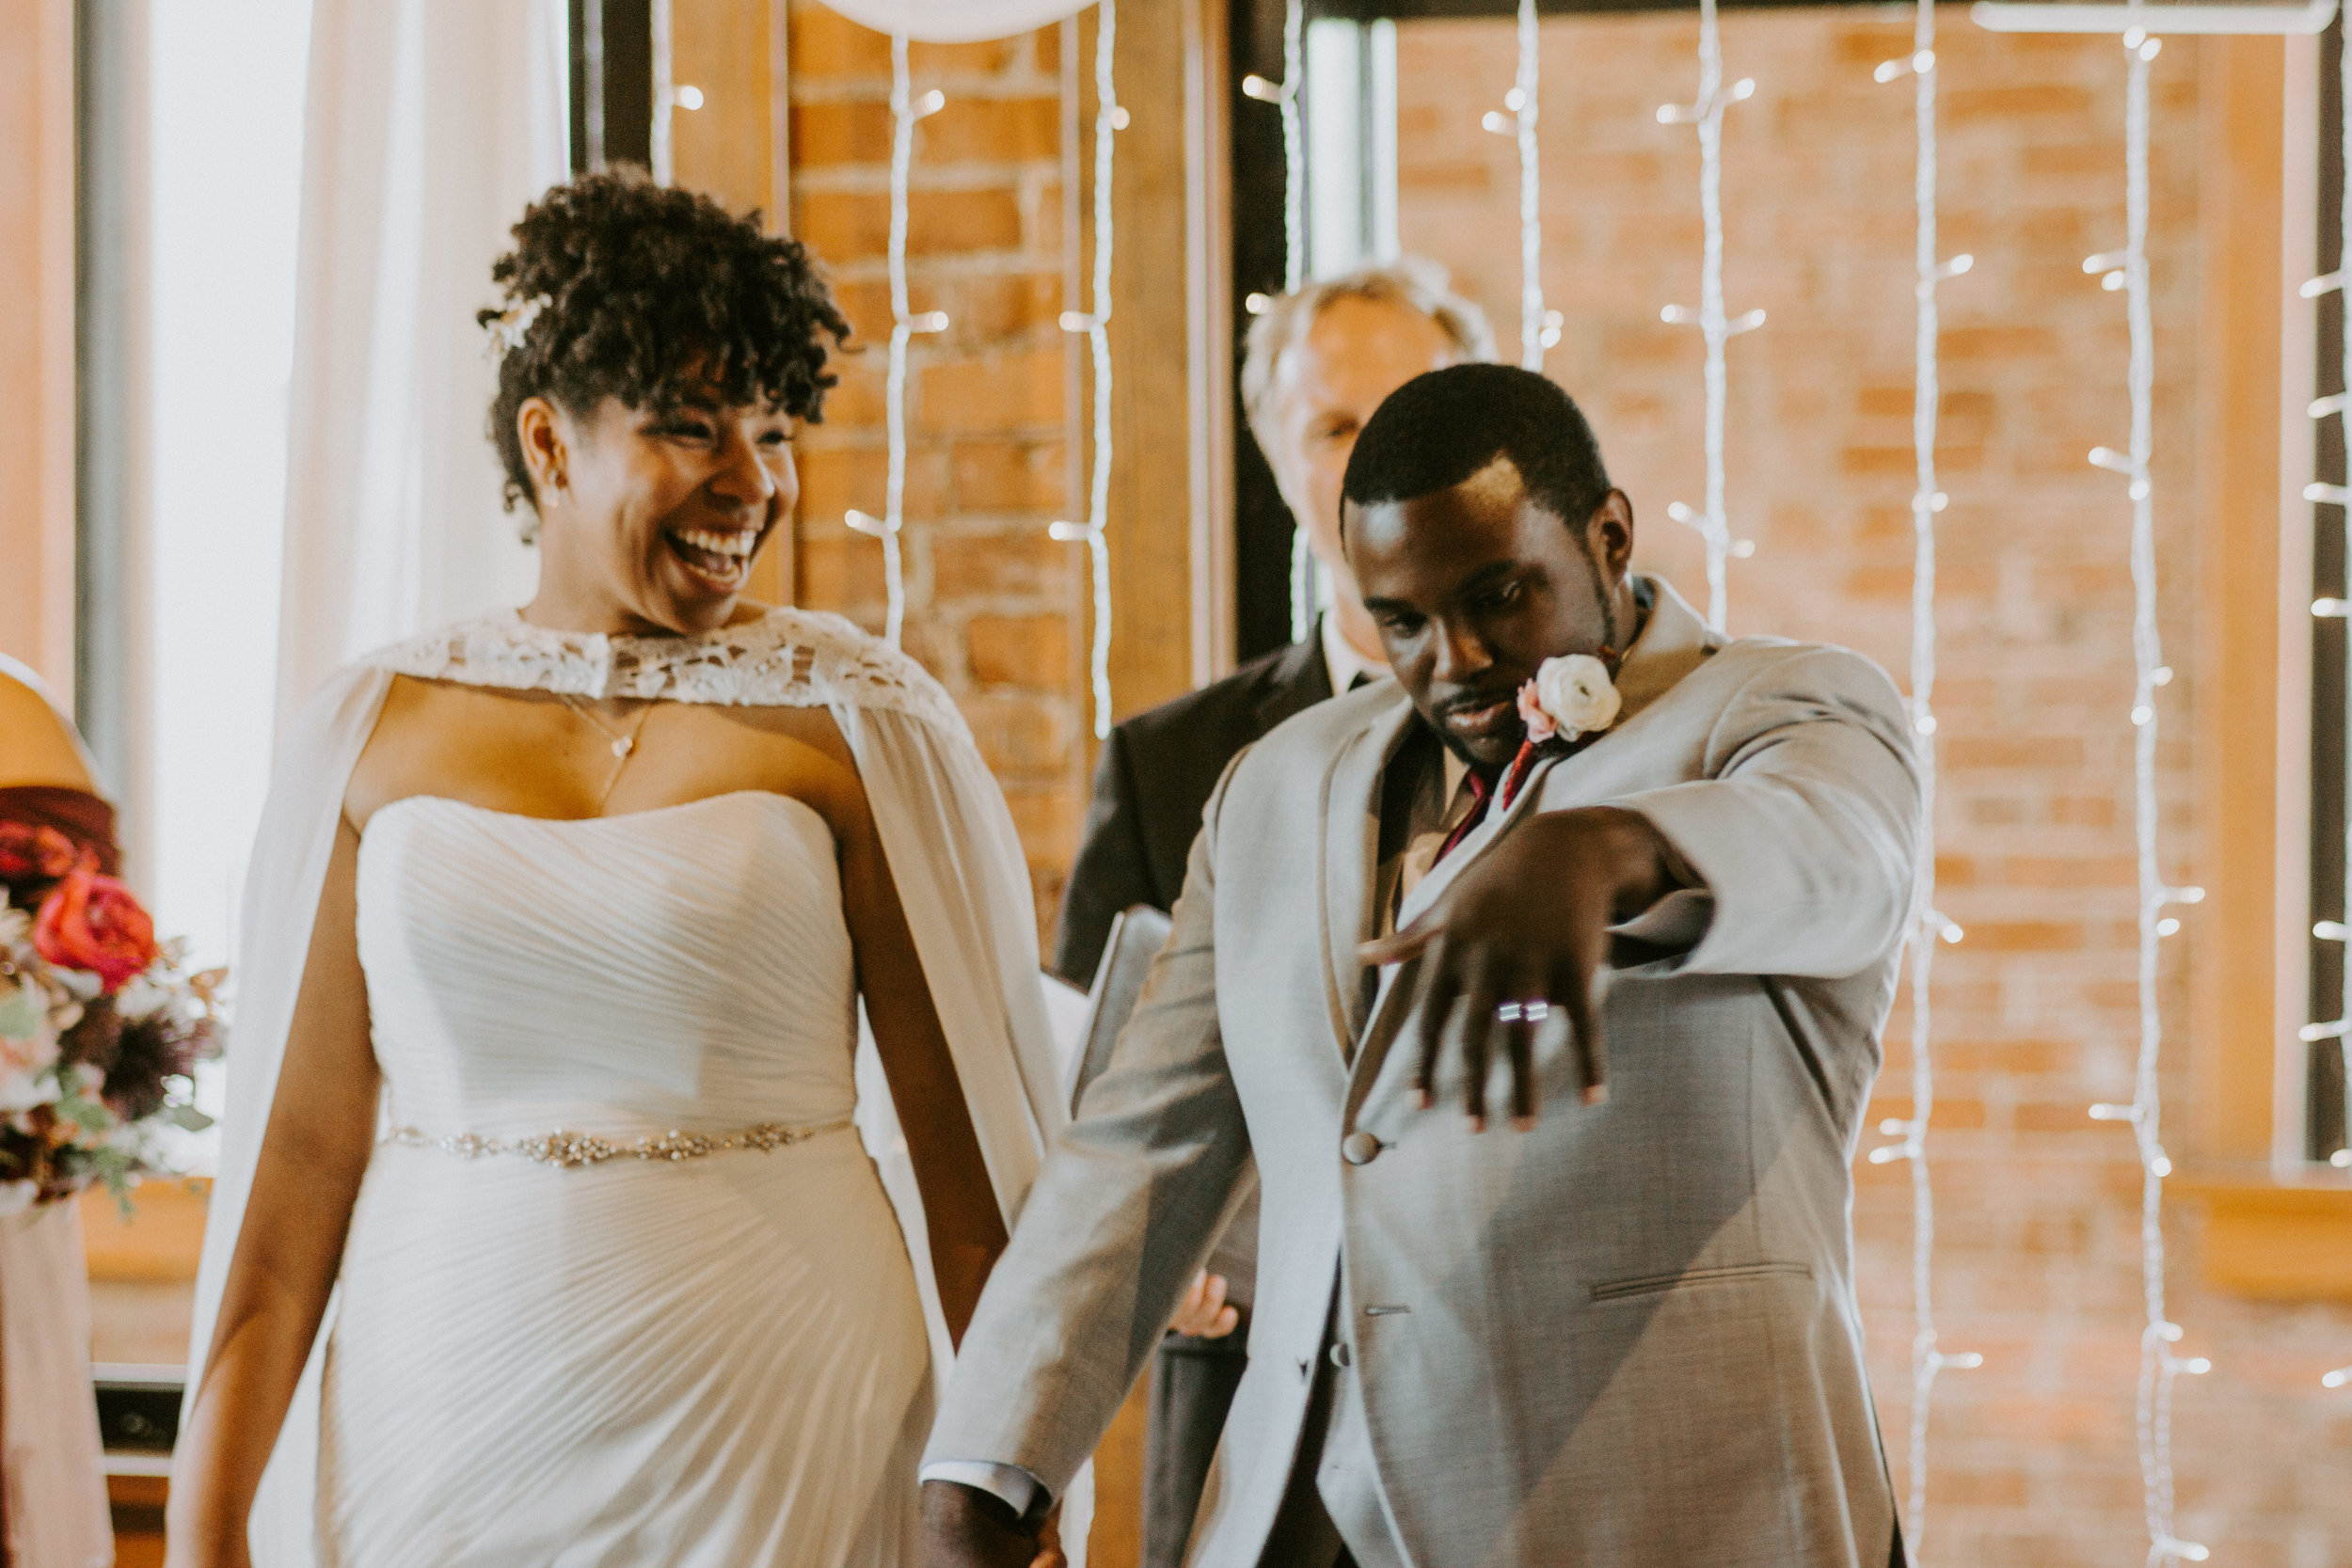 WonderlyCreative_Wedding_6.7.18_Khara&Dwayne_-559.jpg